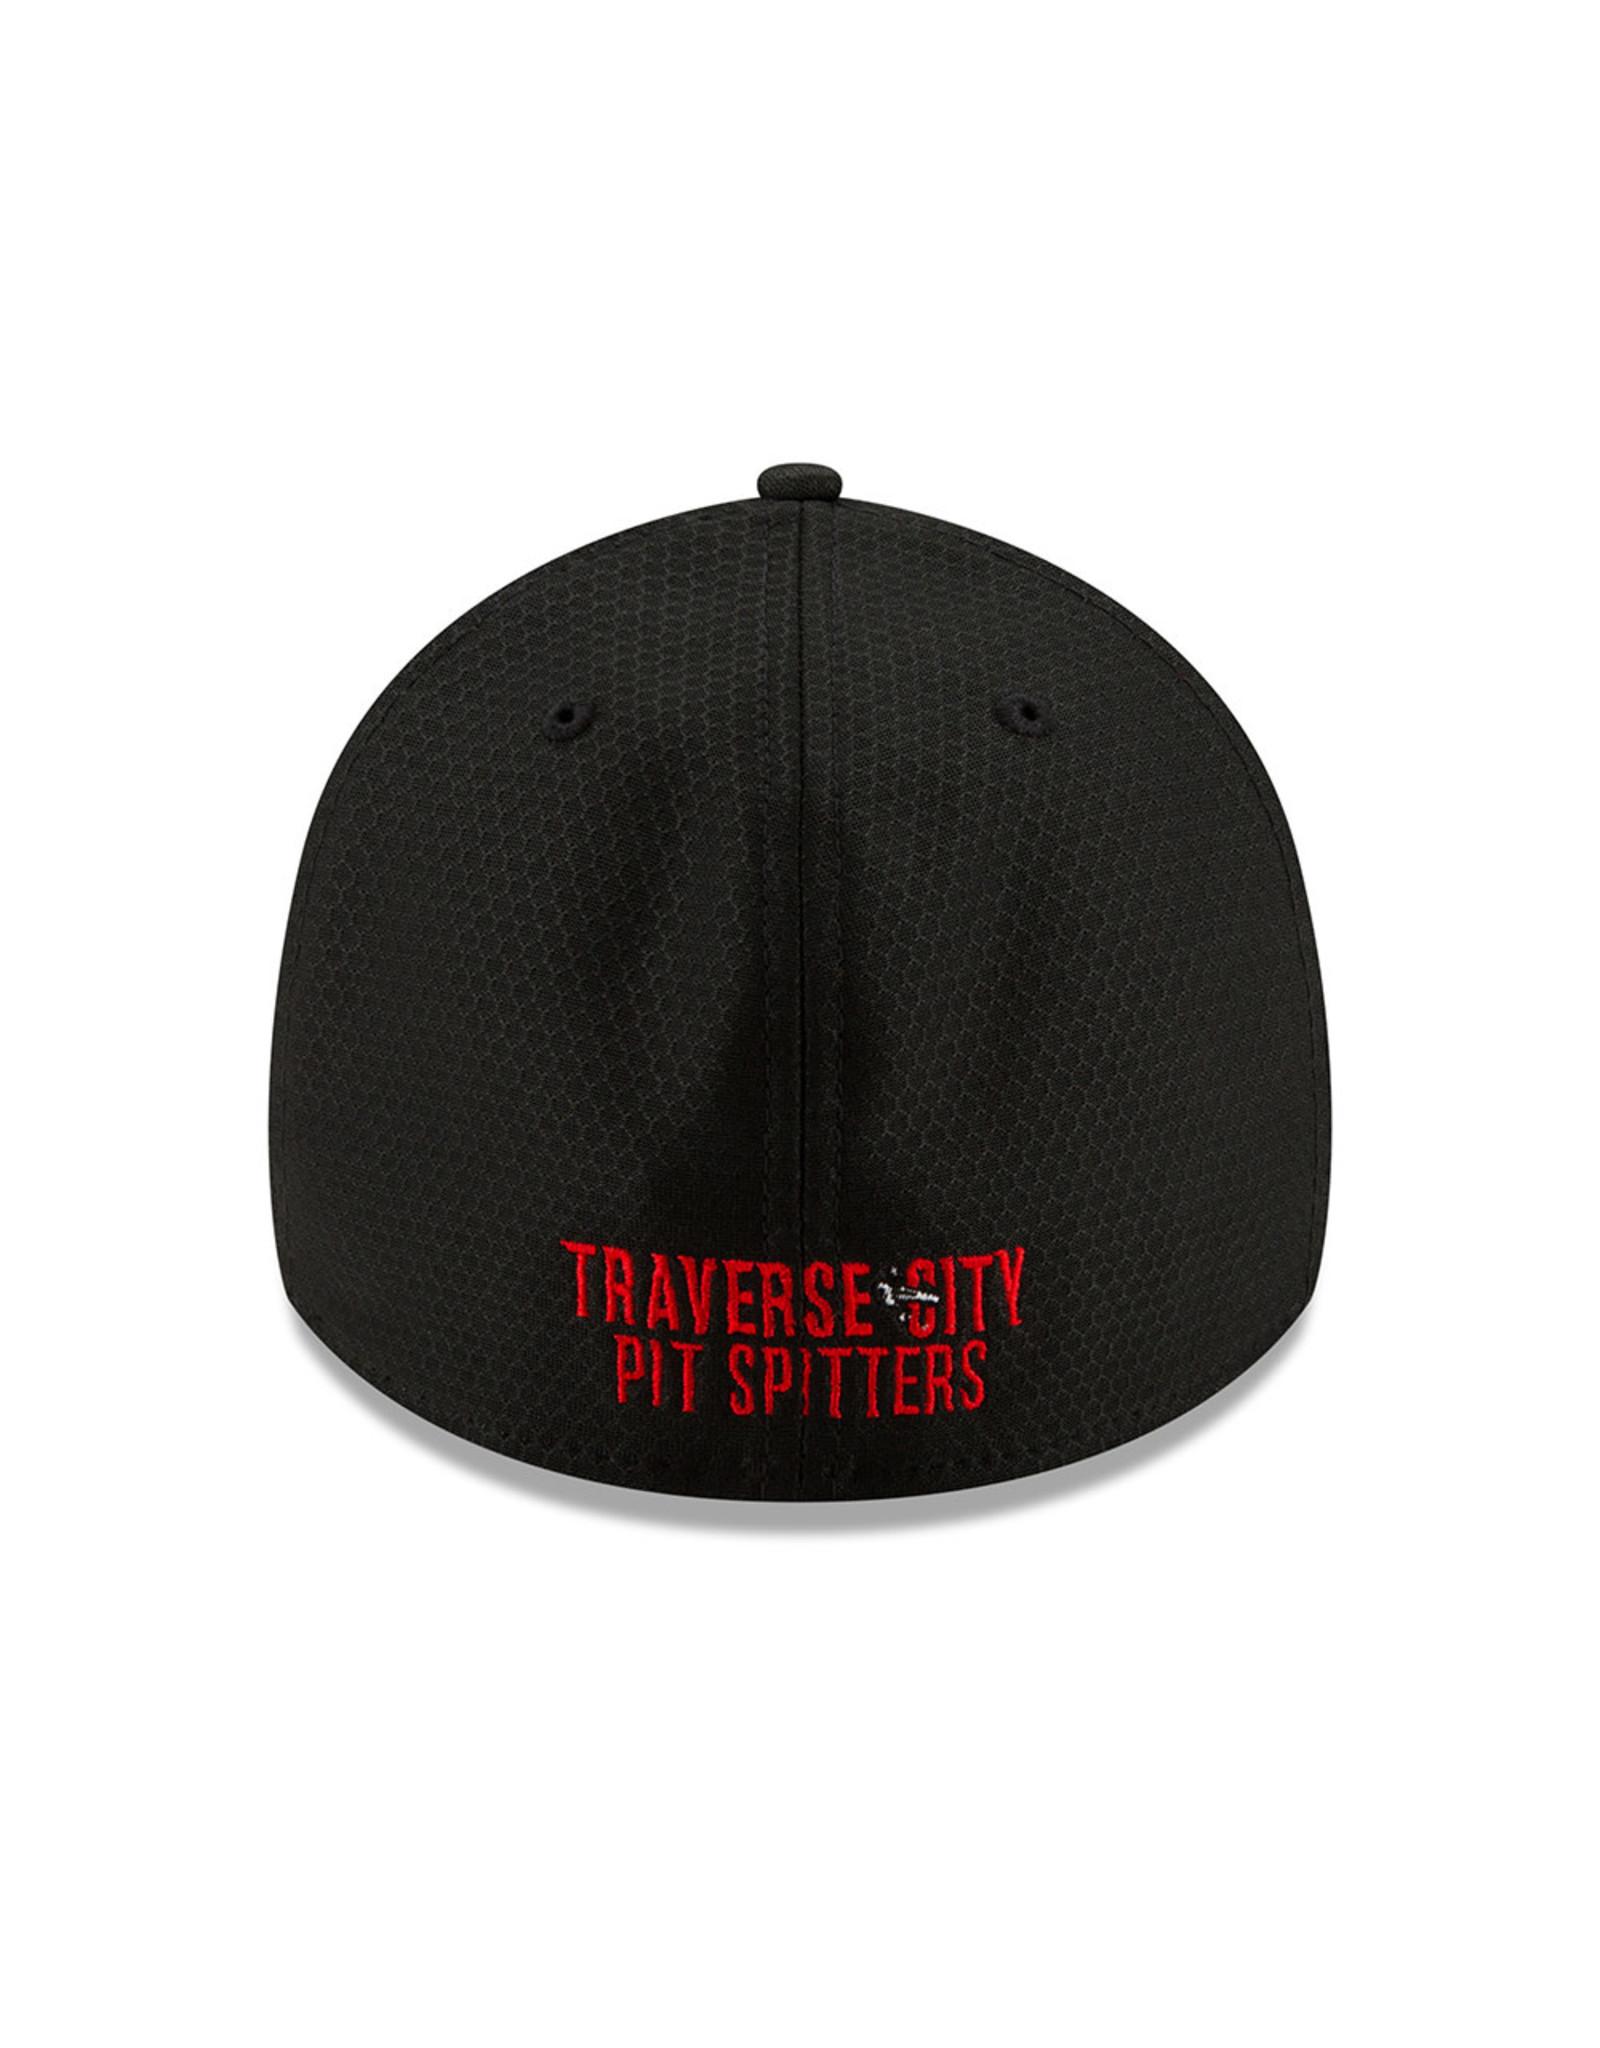 New Era 1133 Rush Black/Red 3930 Cap